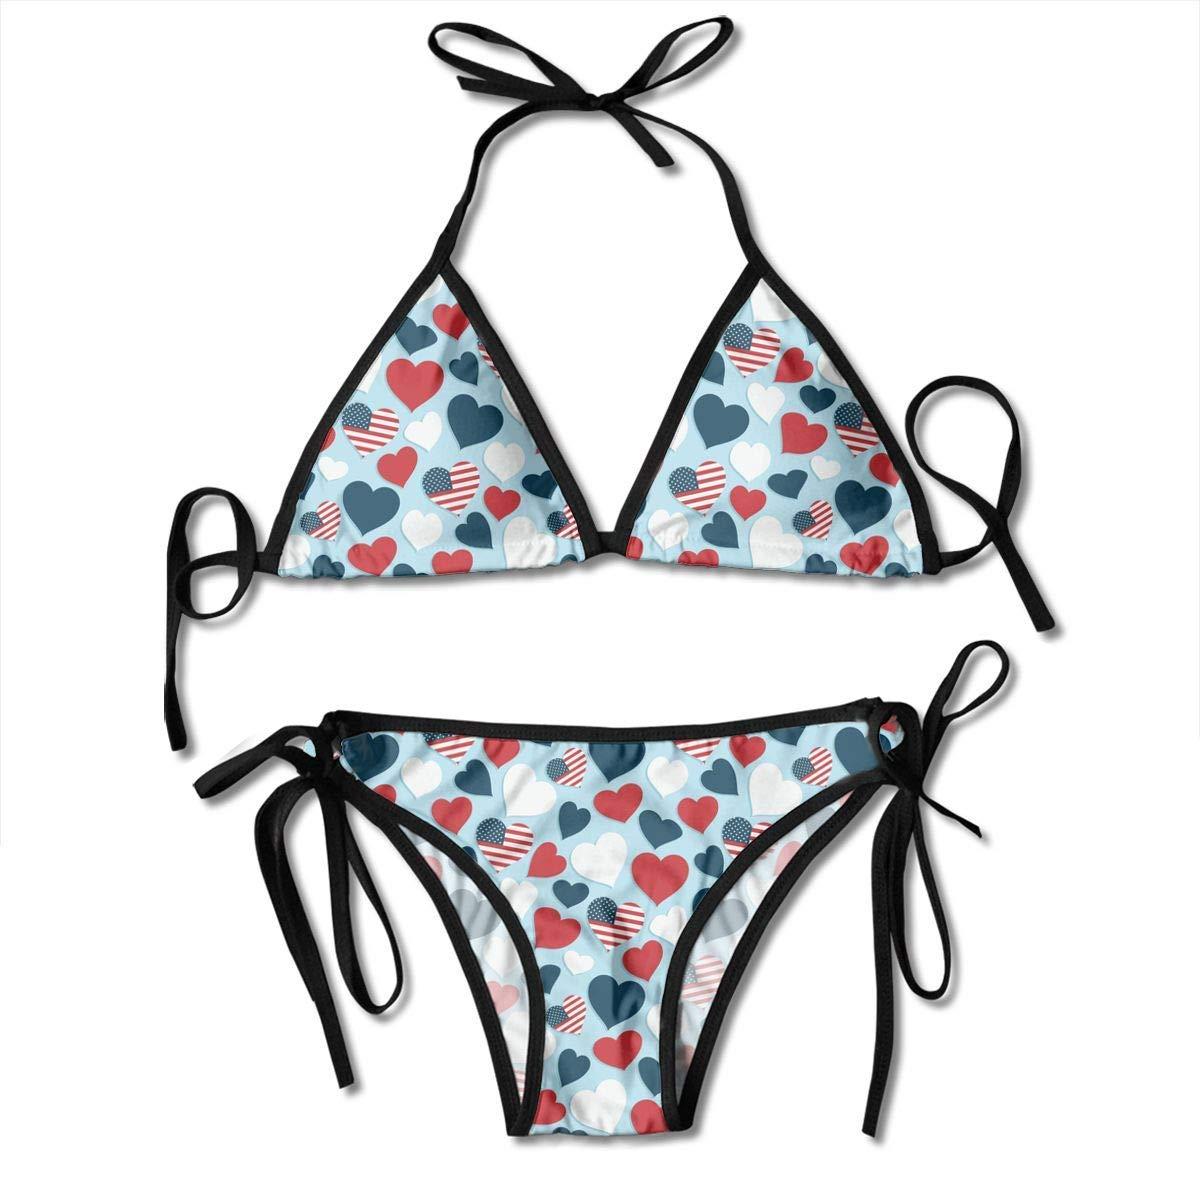 2a15b8927f2f Amazon.com: FunnyStuffs Women's Bathing Suit Adjustable USA Flag Heart  Pattern Sexy Bikini Set 2 Piece Black: Clothing